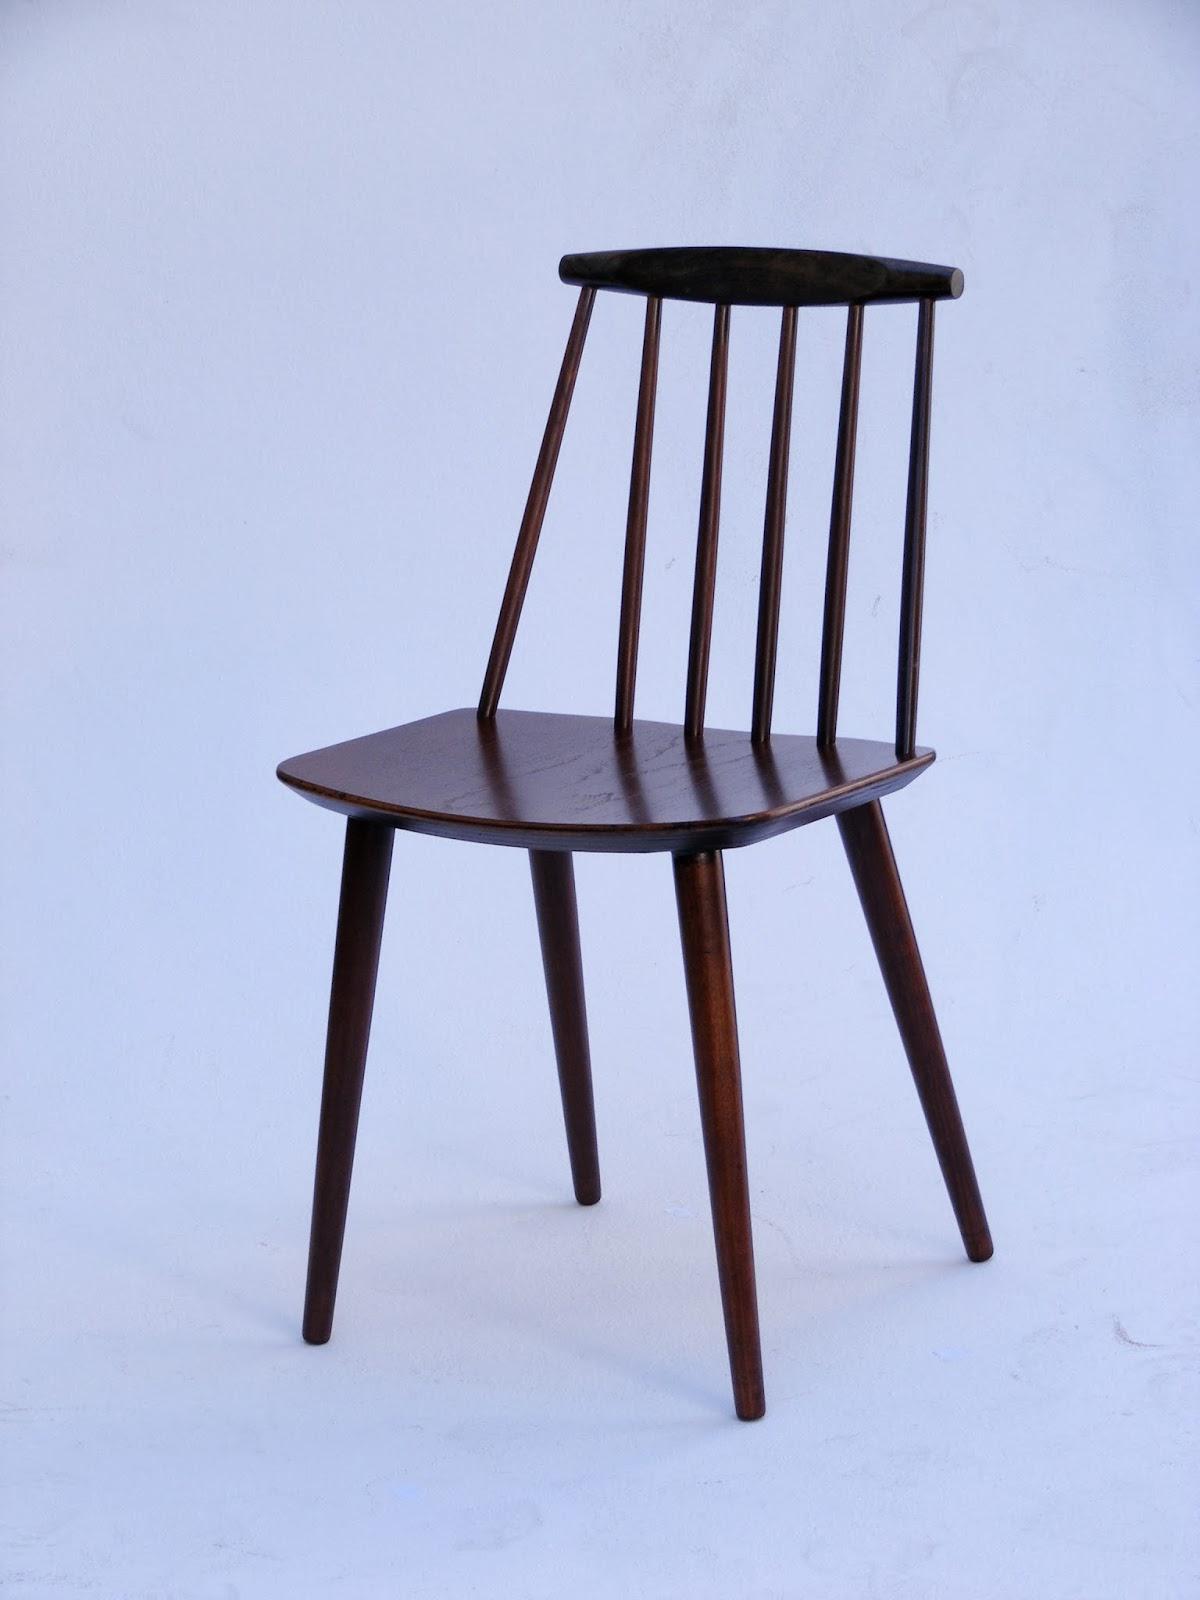 VAMP FURNITURE: This weeks new furniture stock at Vamp - 29 ...